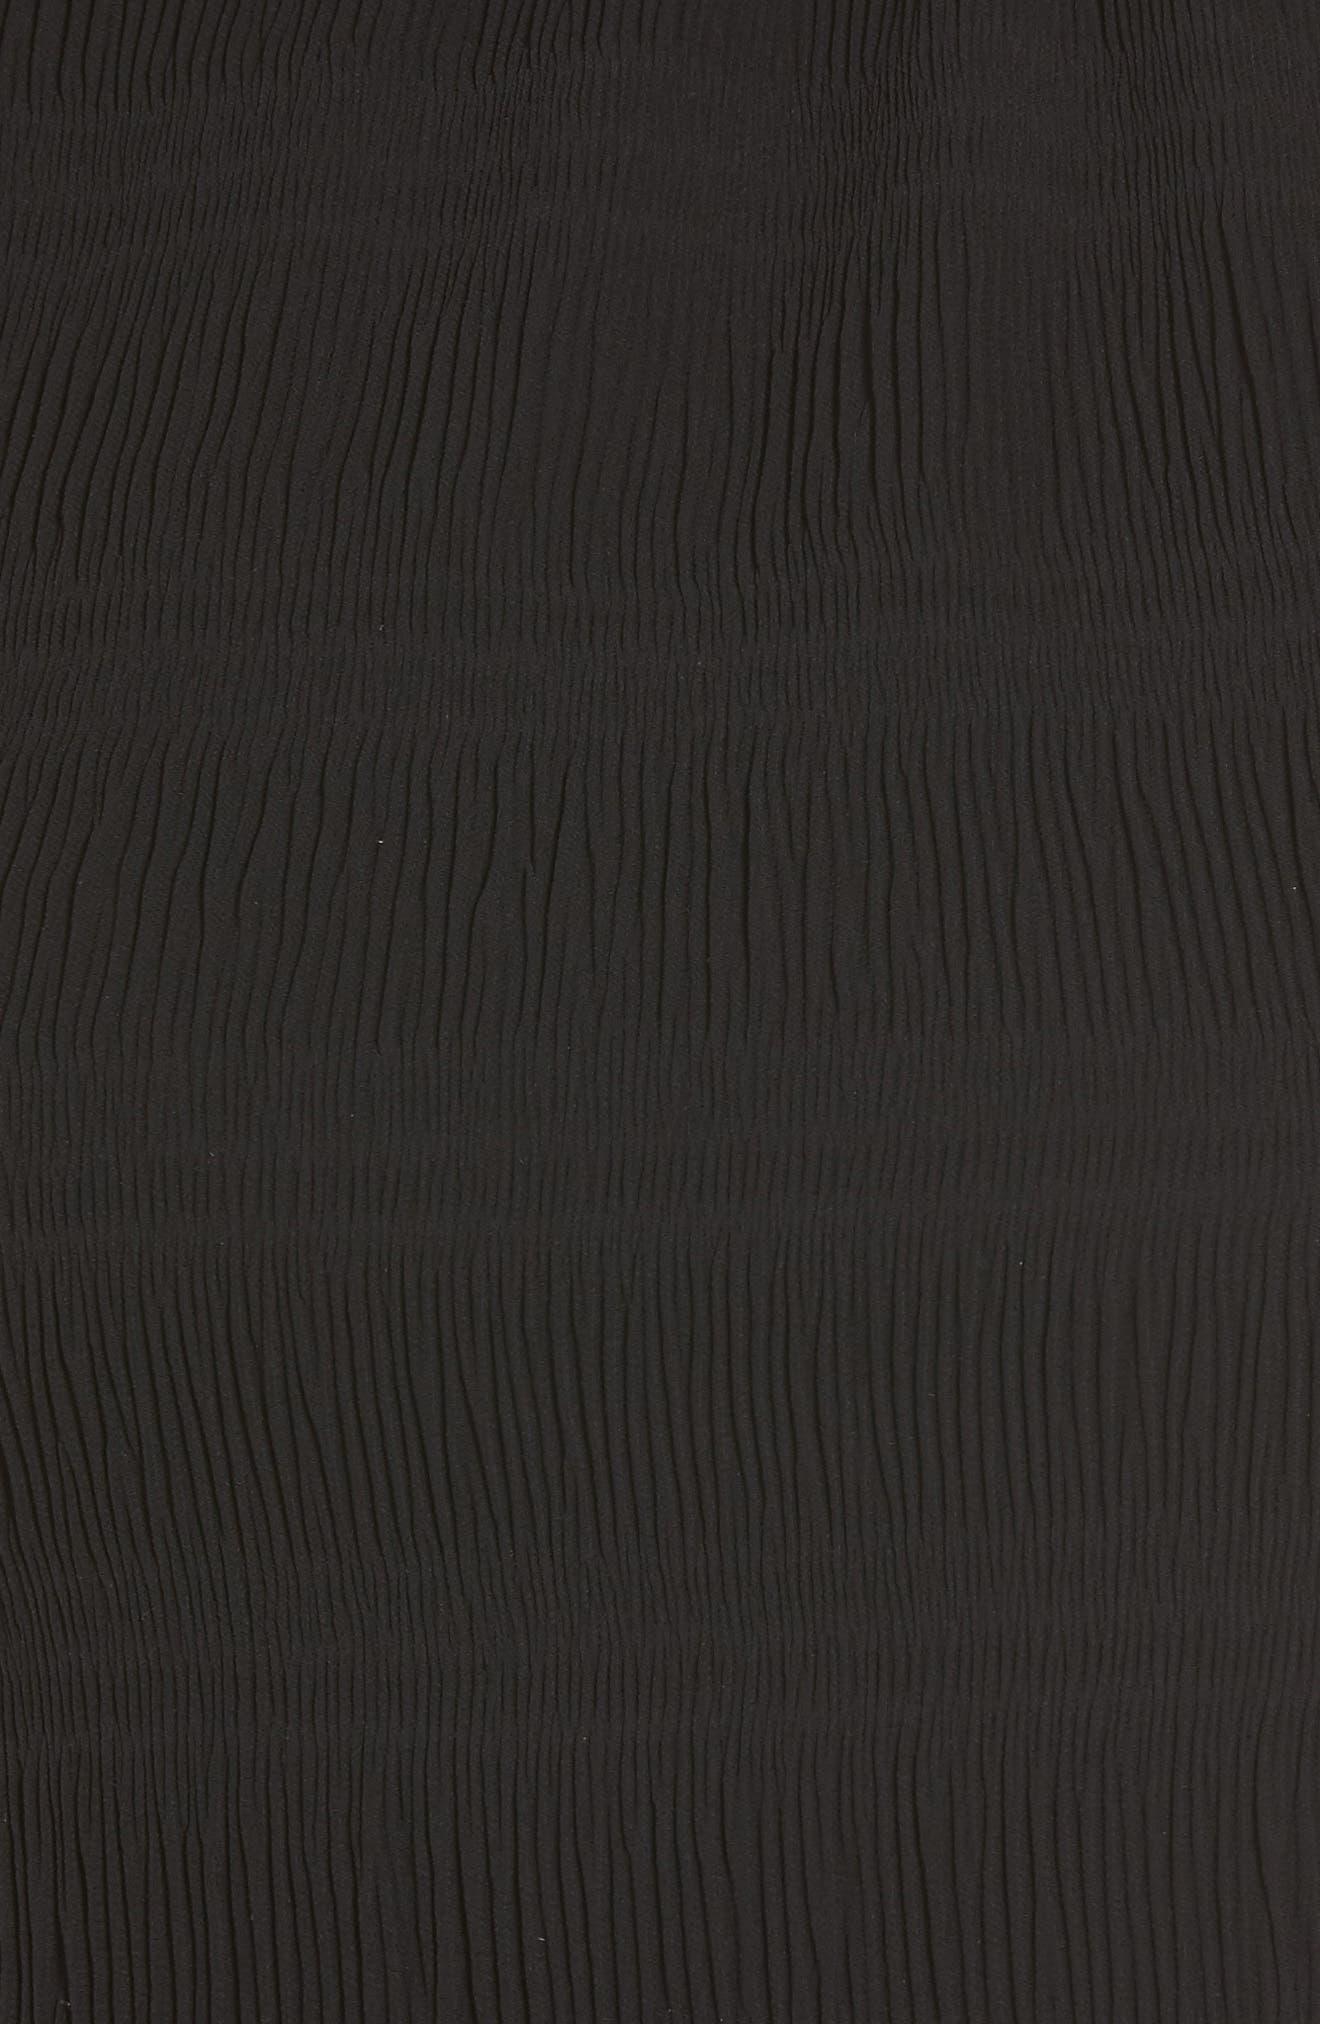 Smocked Neck Crop Top,                             Alternate thumbnail 6, color,                             Black